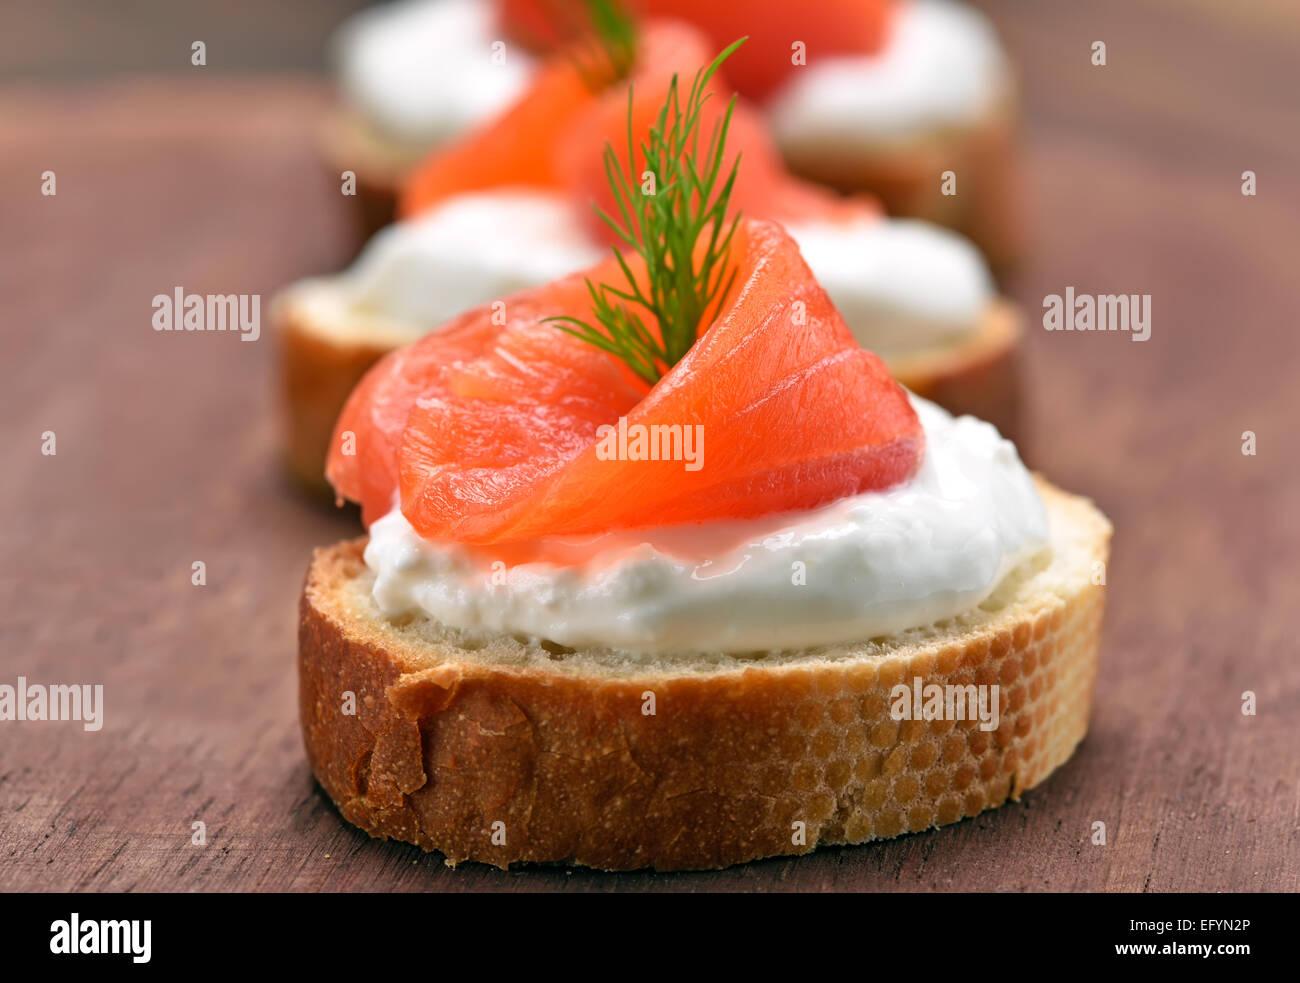 Sandwiches mit Lachs auf Holzbrett, Nahaufnahme Stockbild